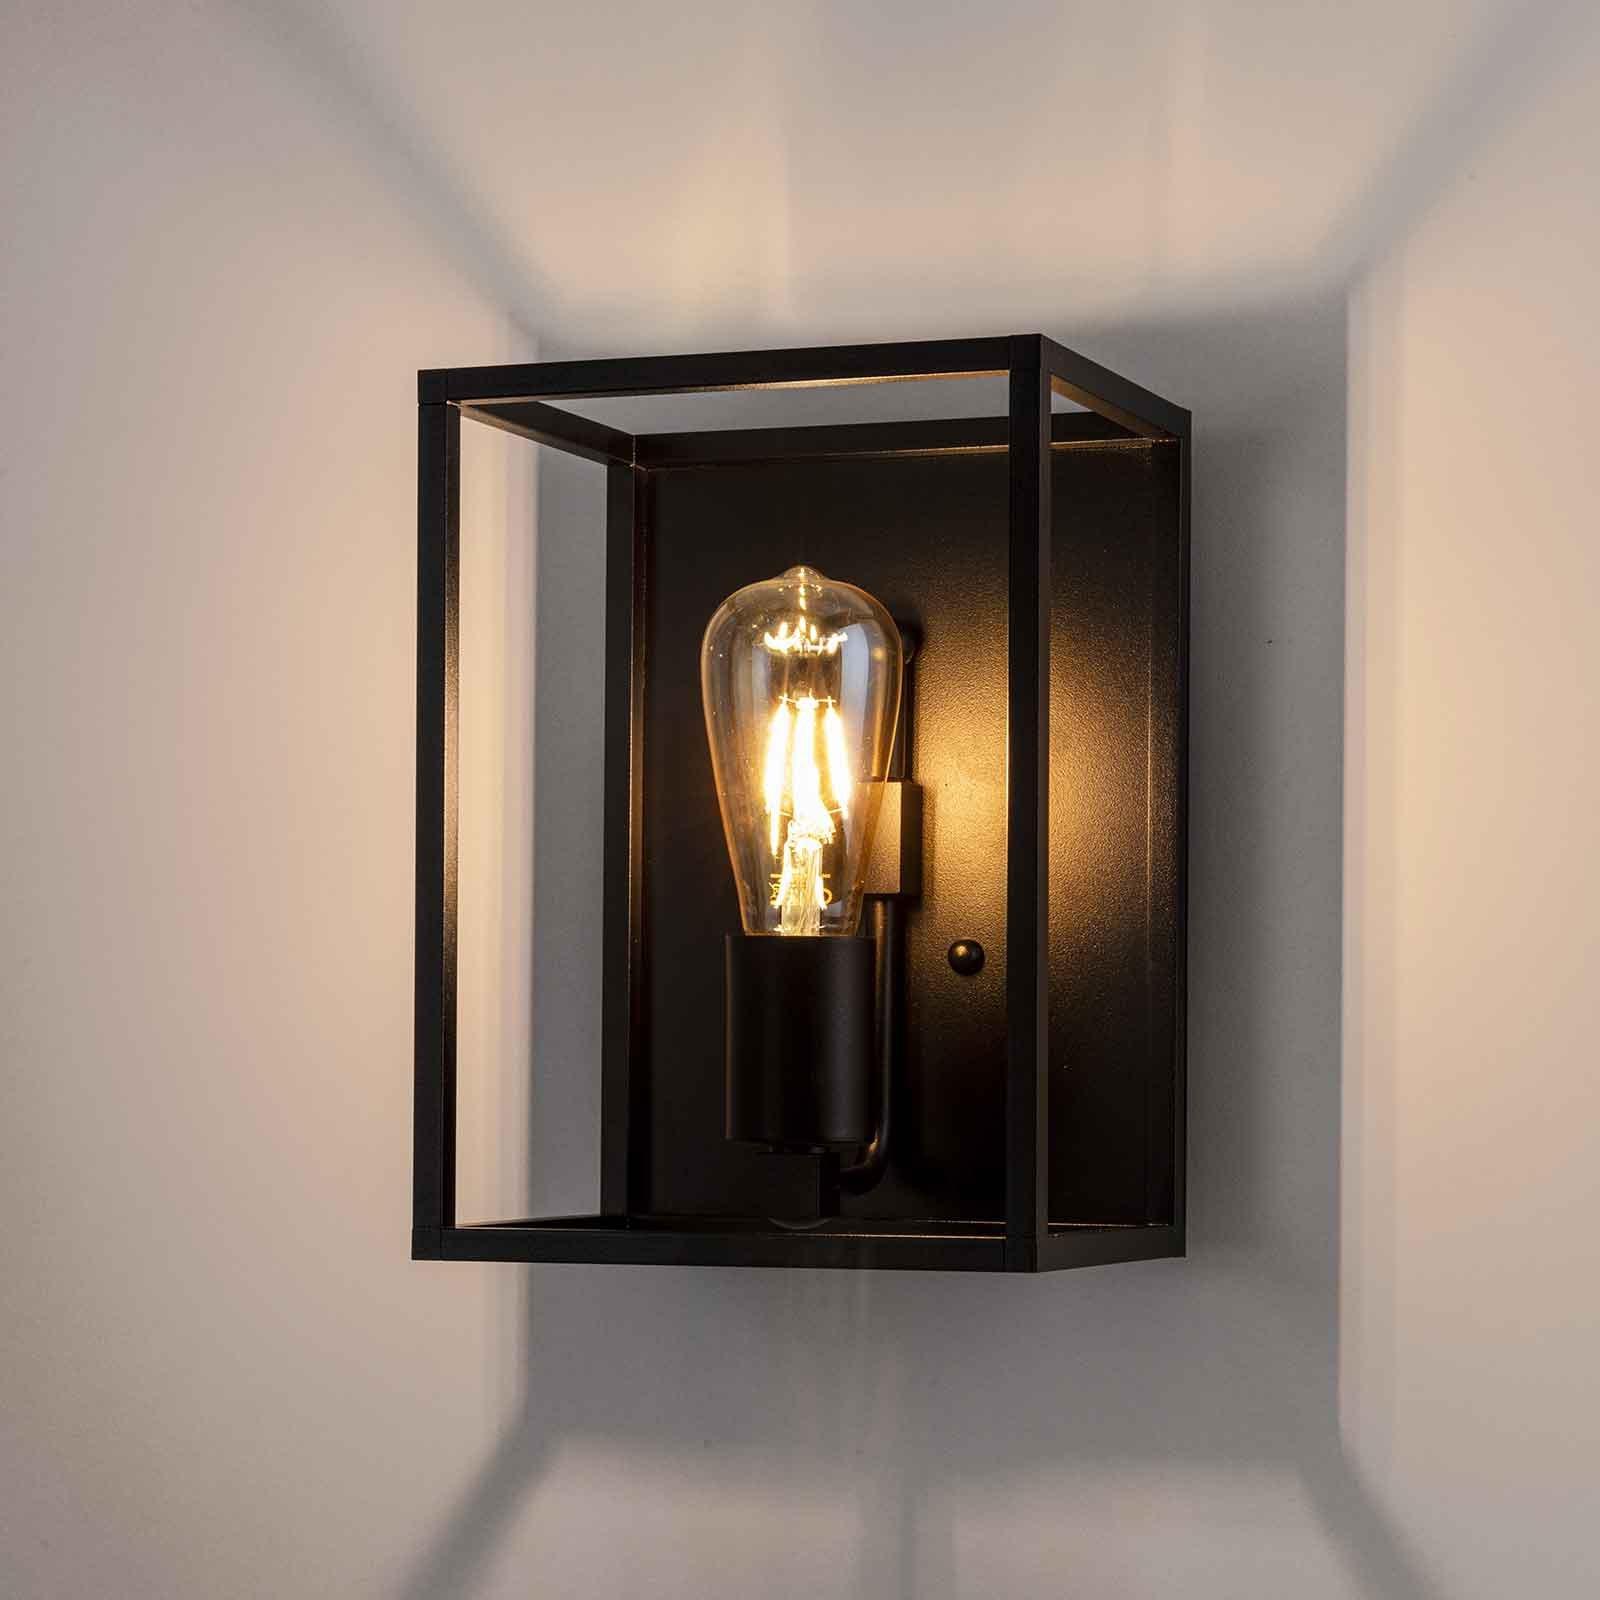 Cubic³ 3382 vegglampe svart, bredde 20 cm